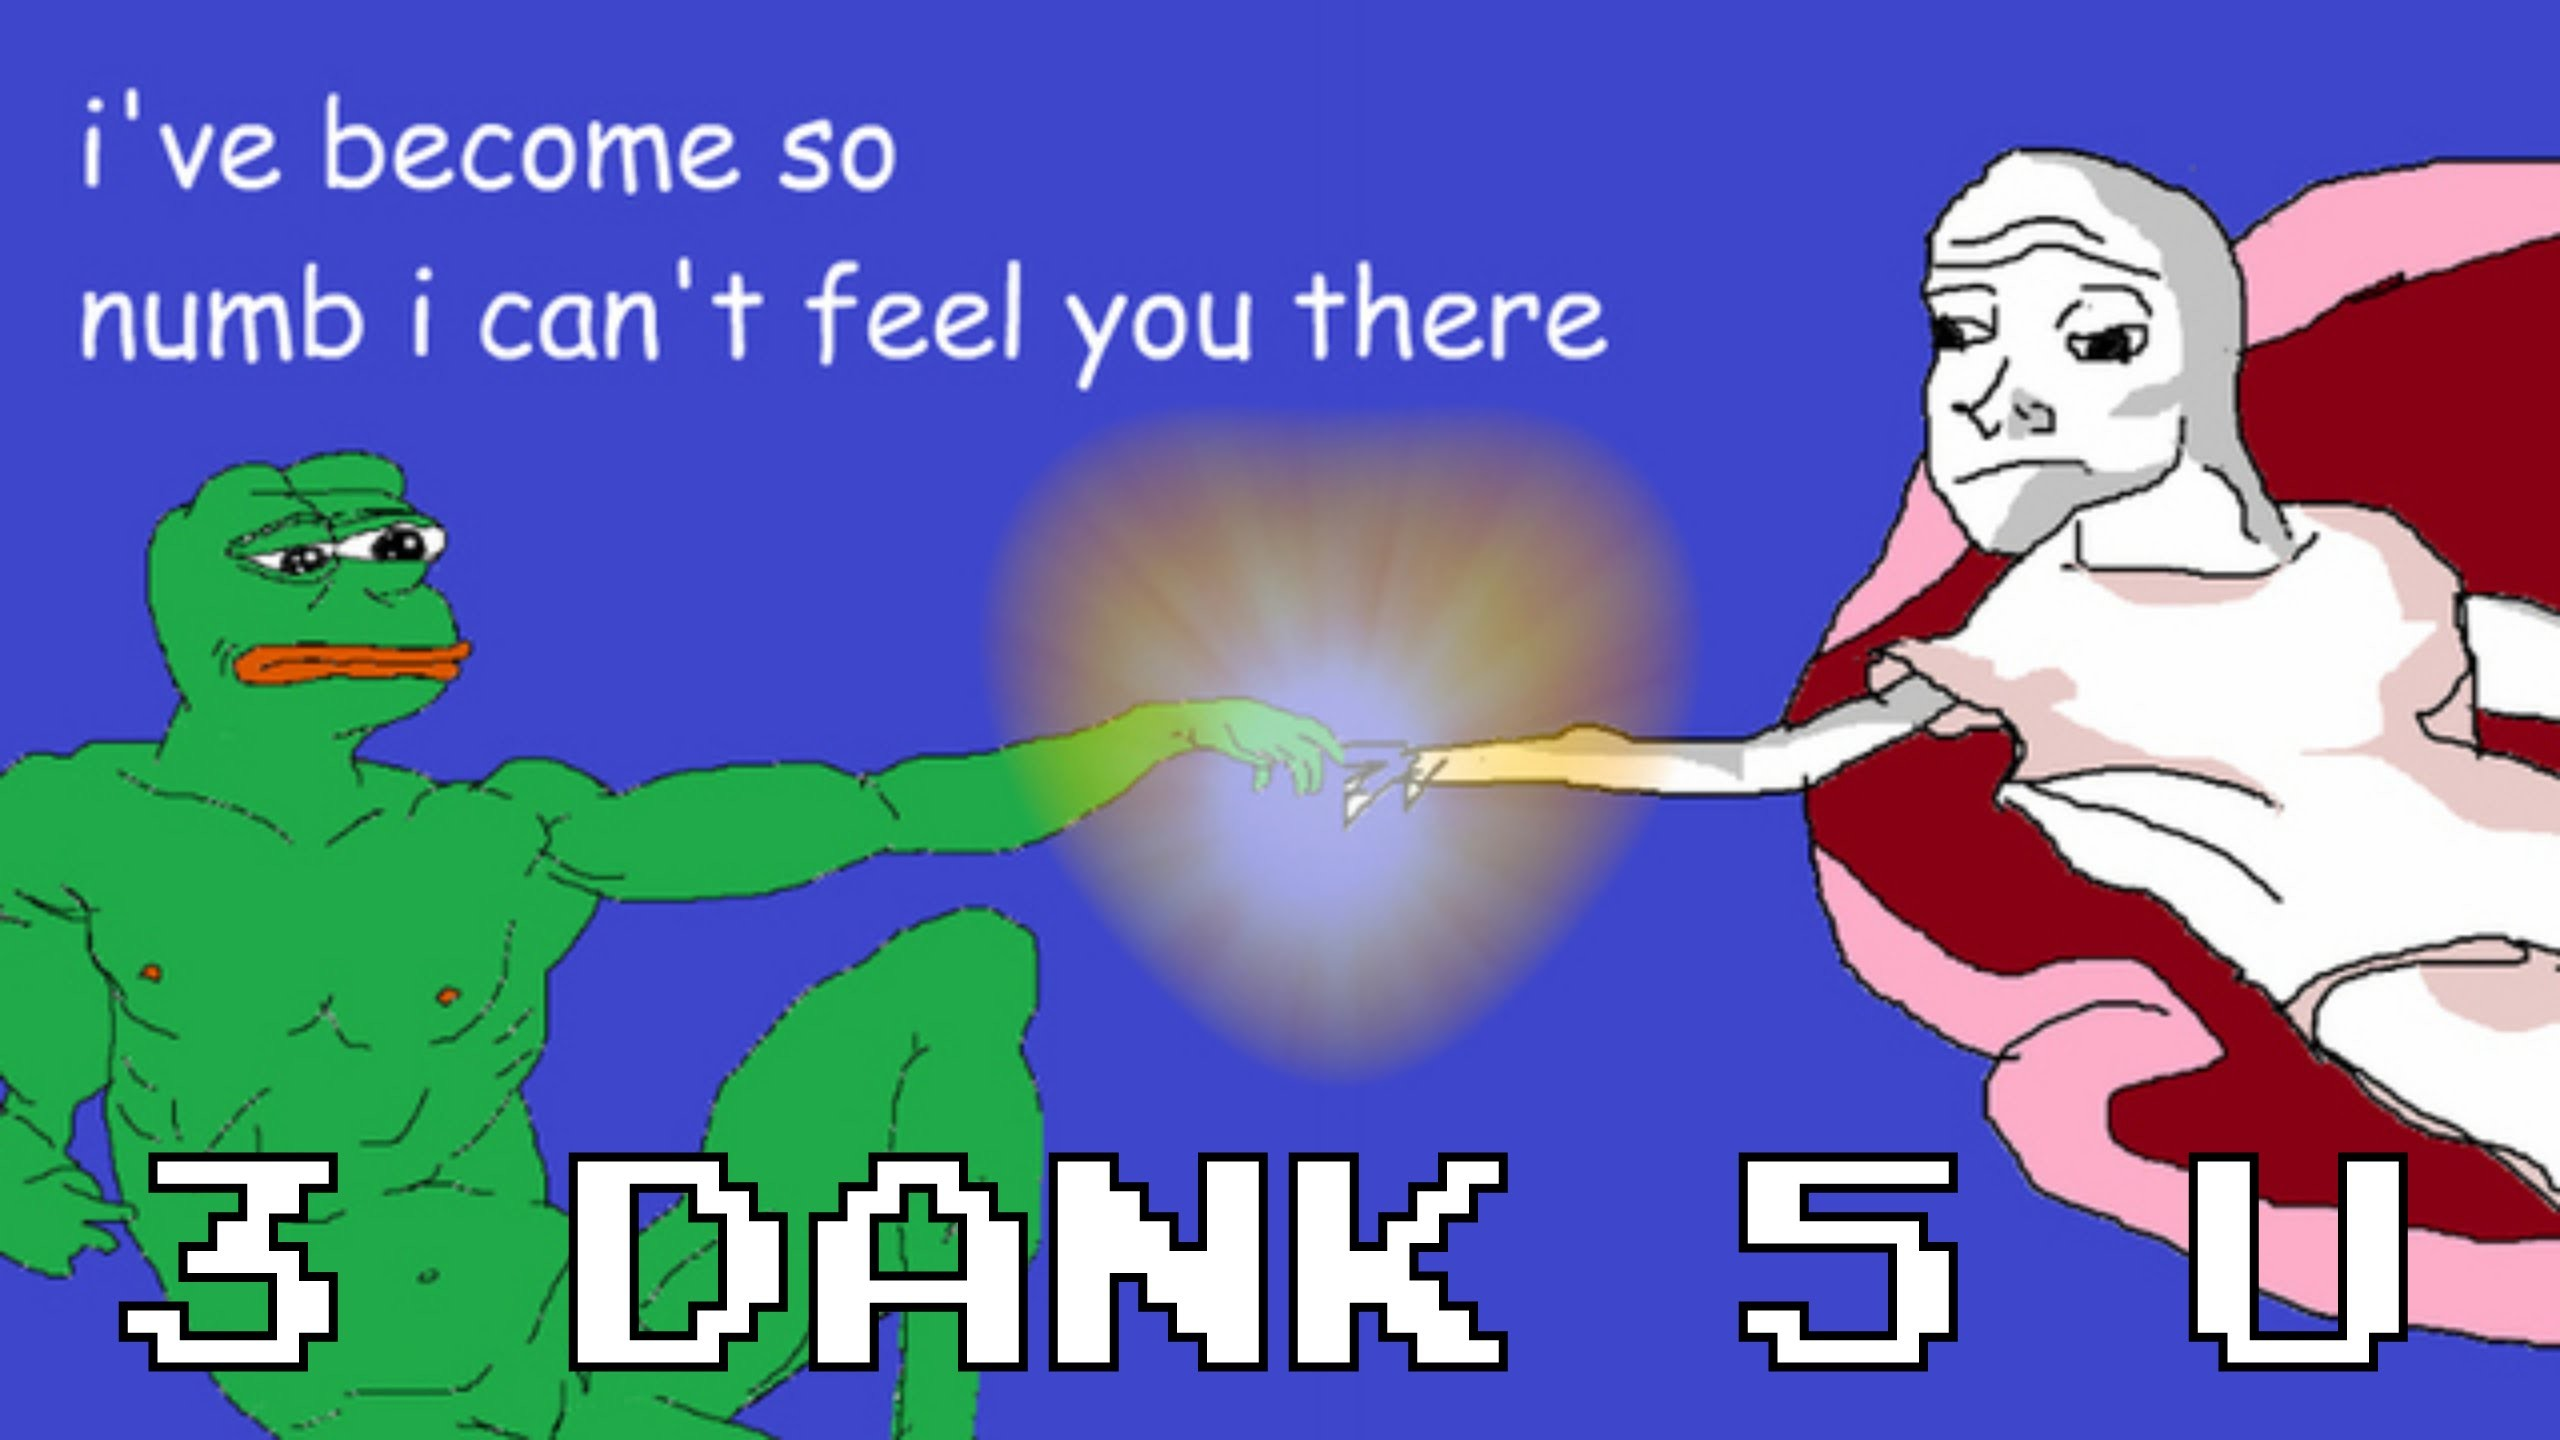 Dank Meme Wallpaper - Dank Meme , HD Wallpaper & Backgrounds